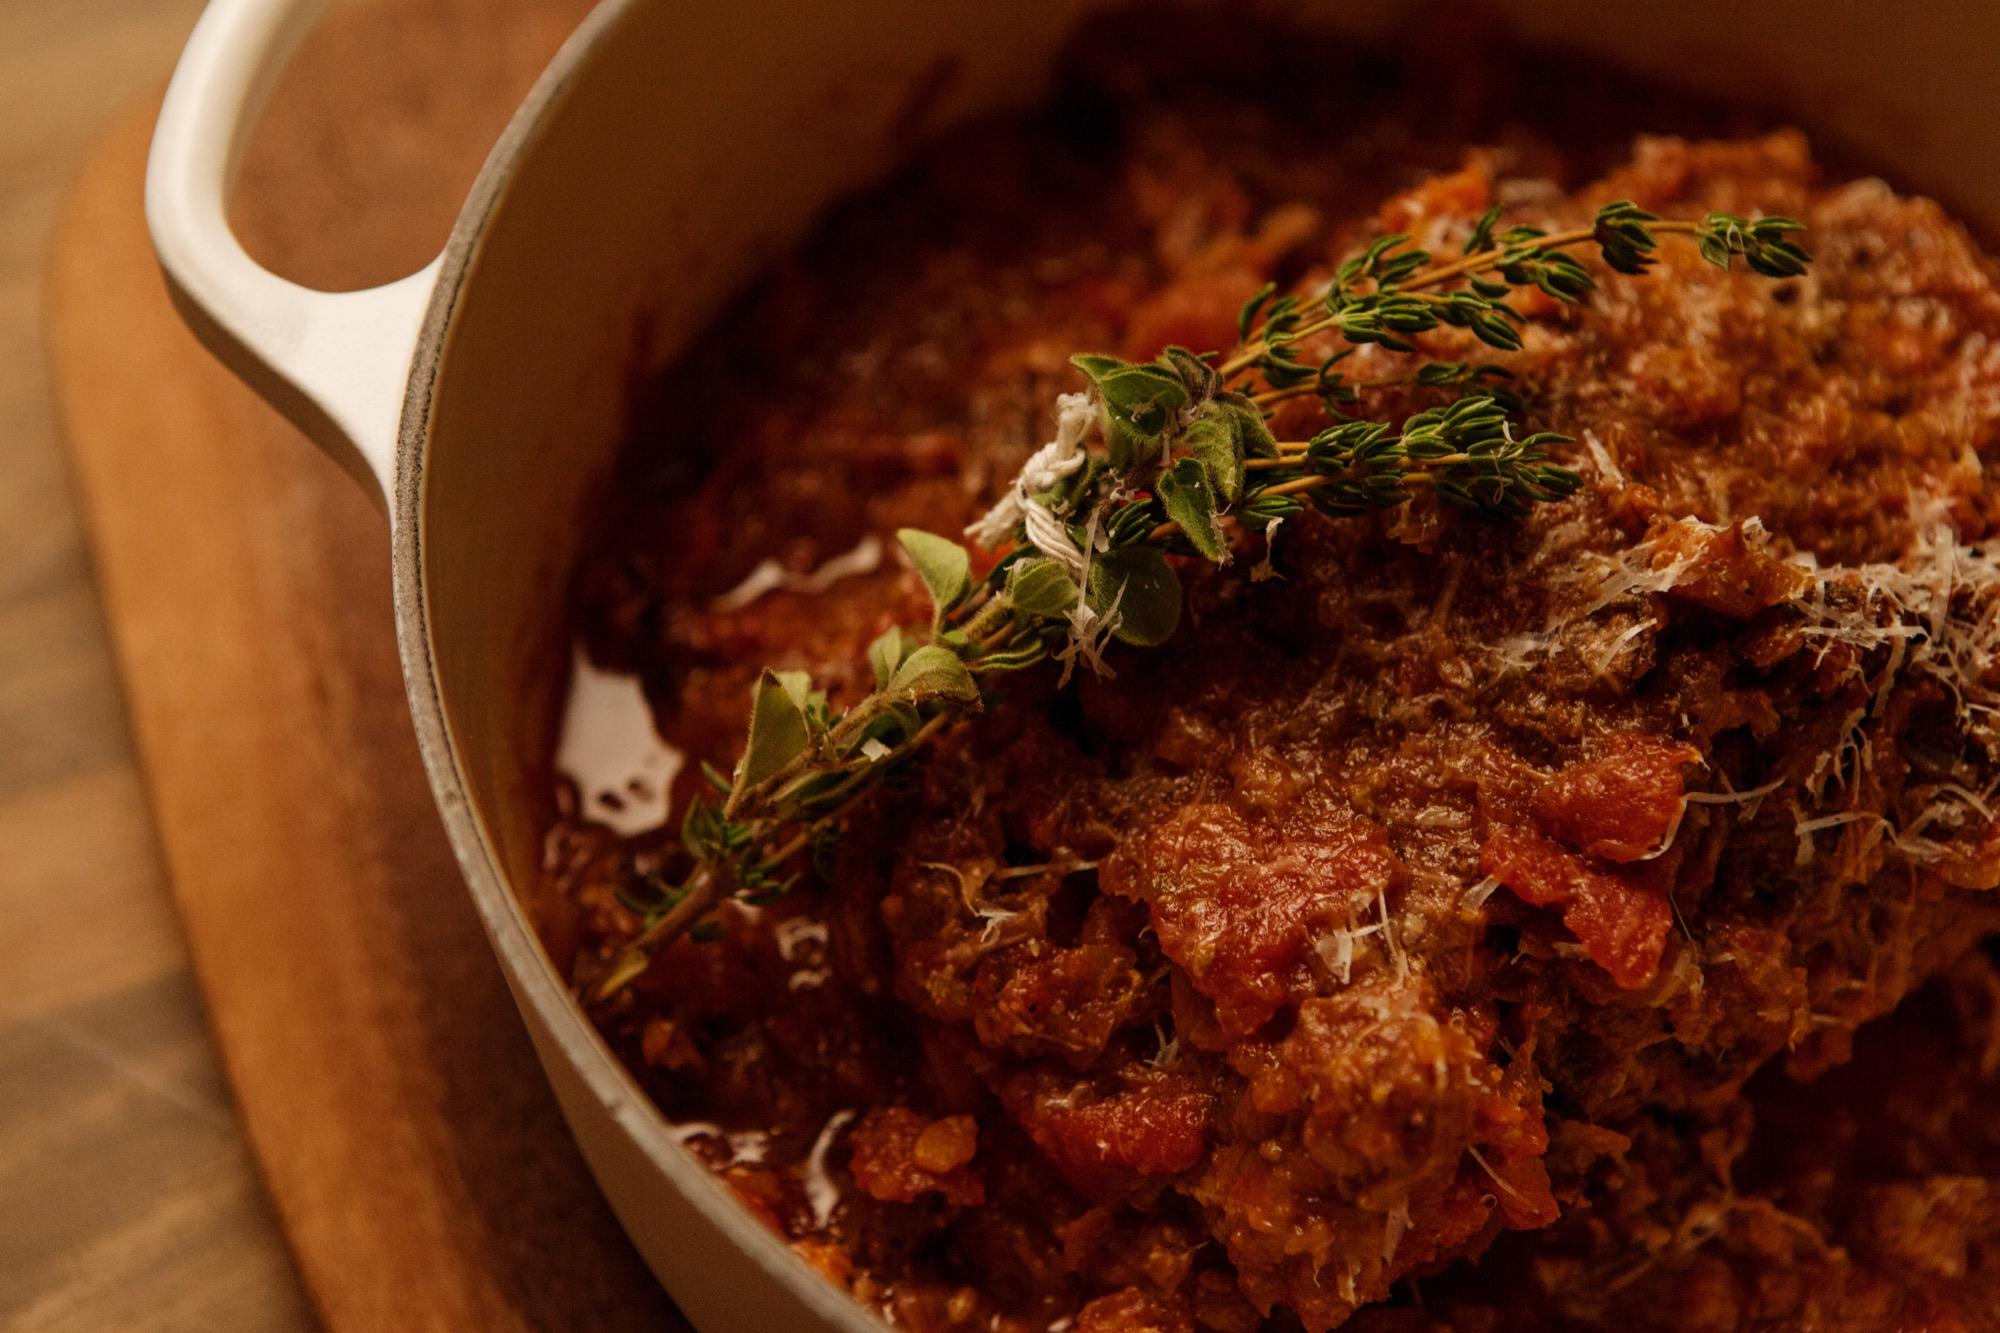 Tomato-Braised Leg of Lamb / Photo by Chris Mueller